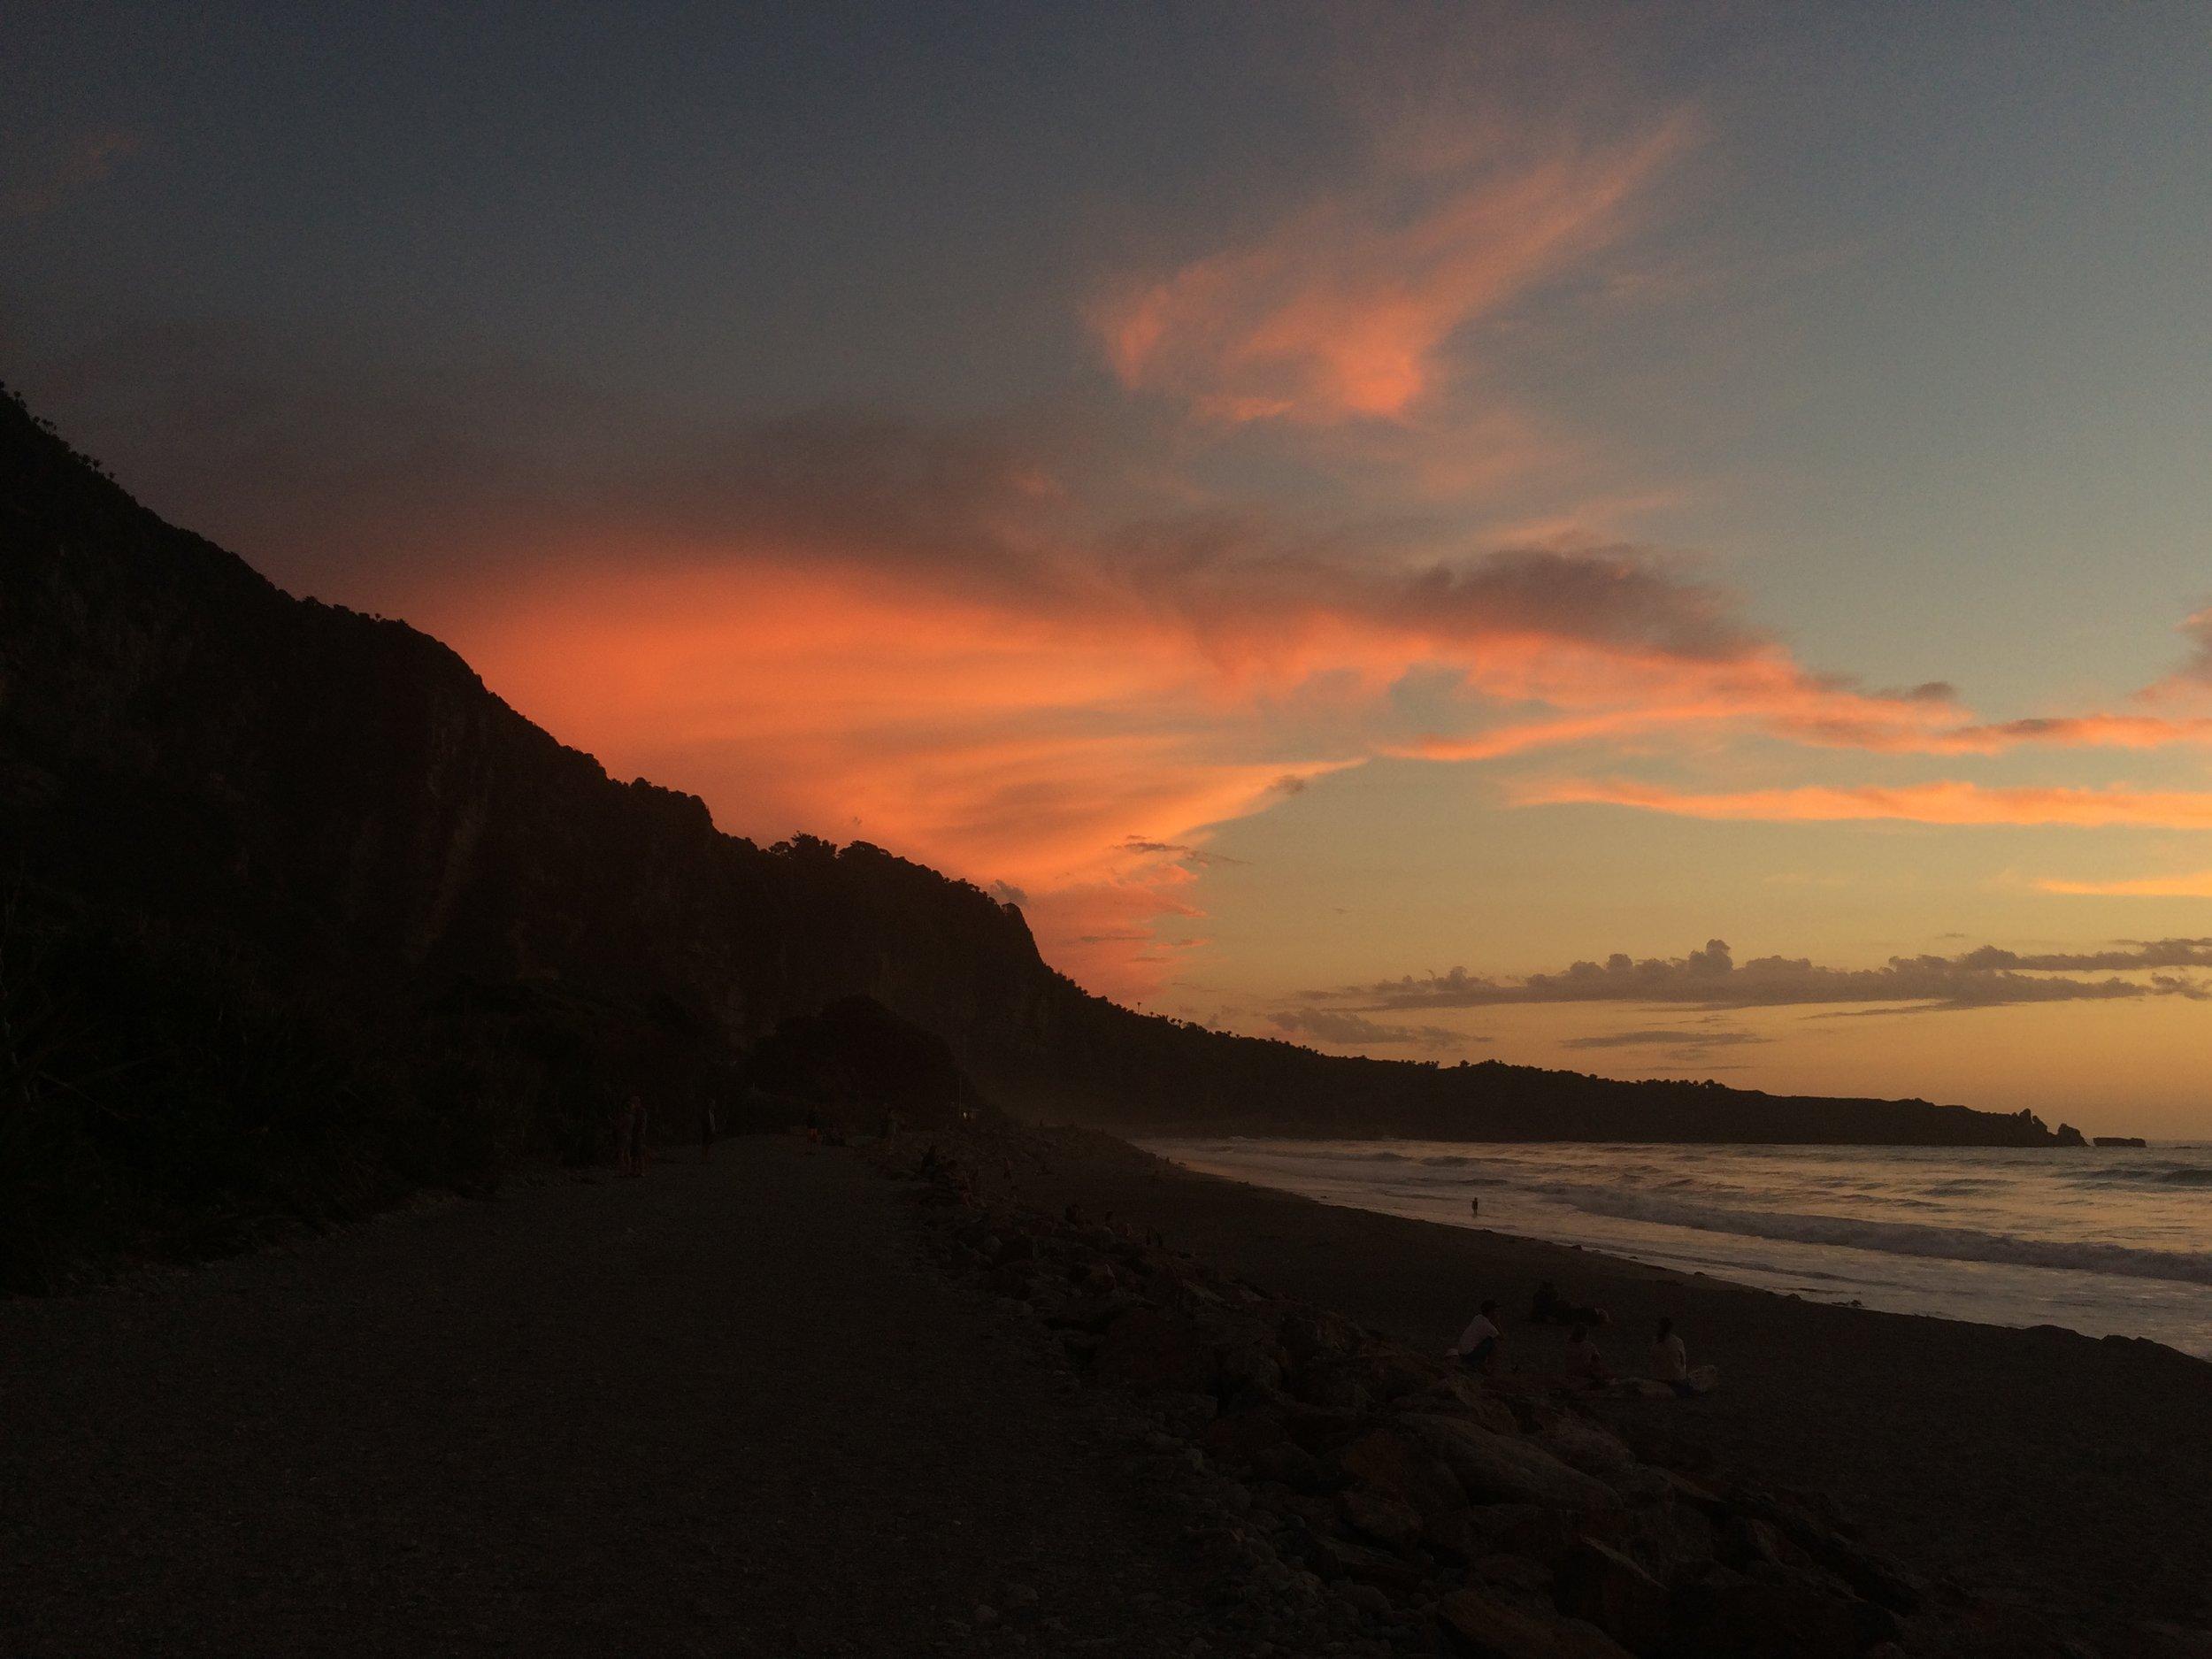 West coast, best coast for epic sunsets.